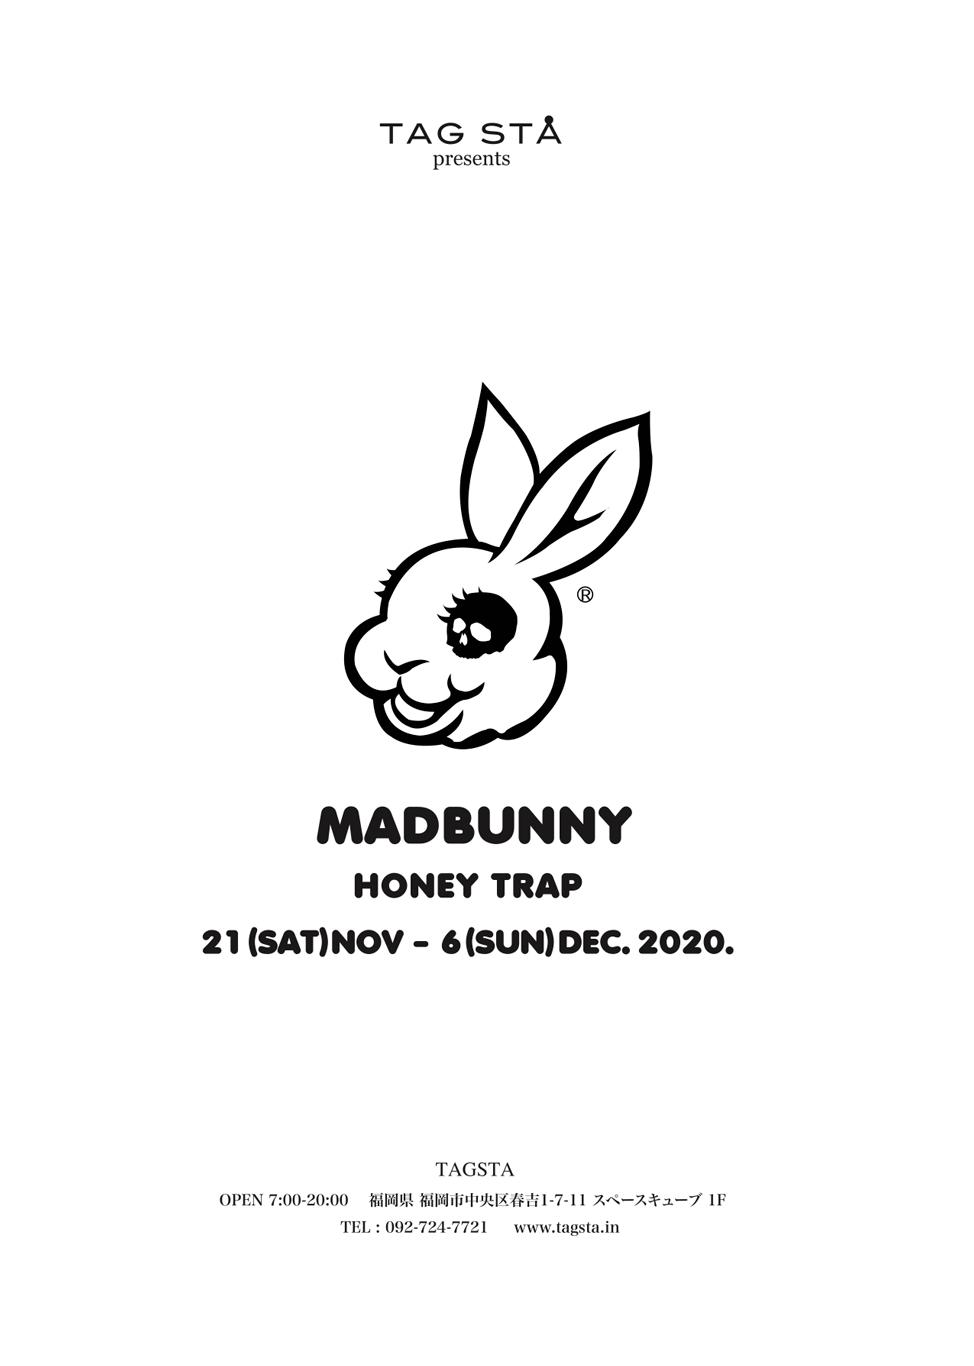 tagsta-202011-MADBUNNY 展